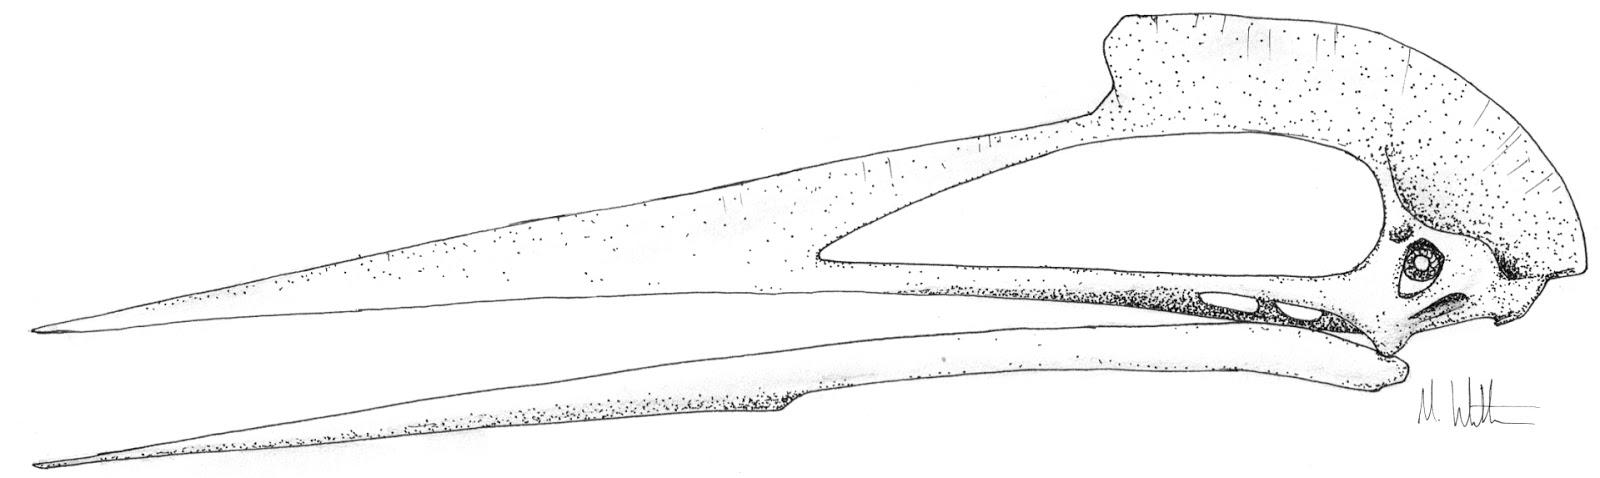 quetzalcoatlus | The Pterosaur Heresies | Page 2